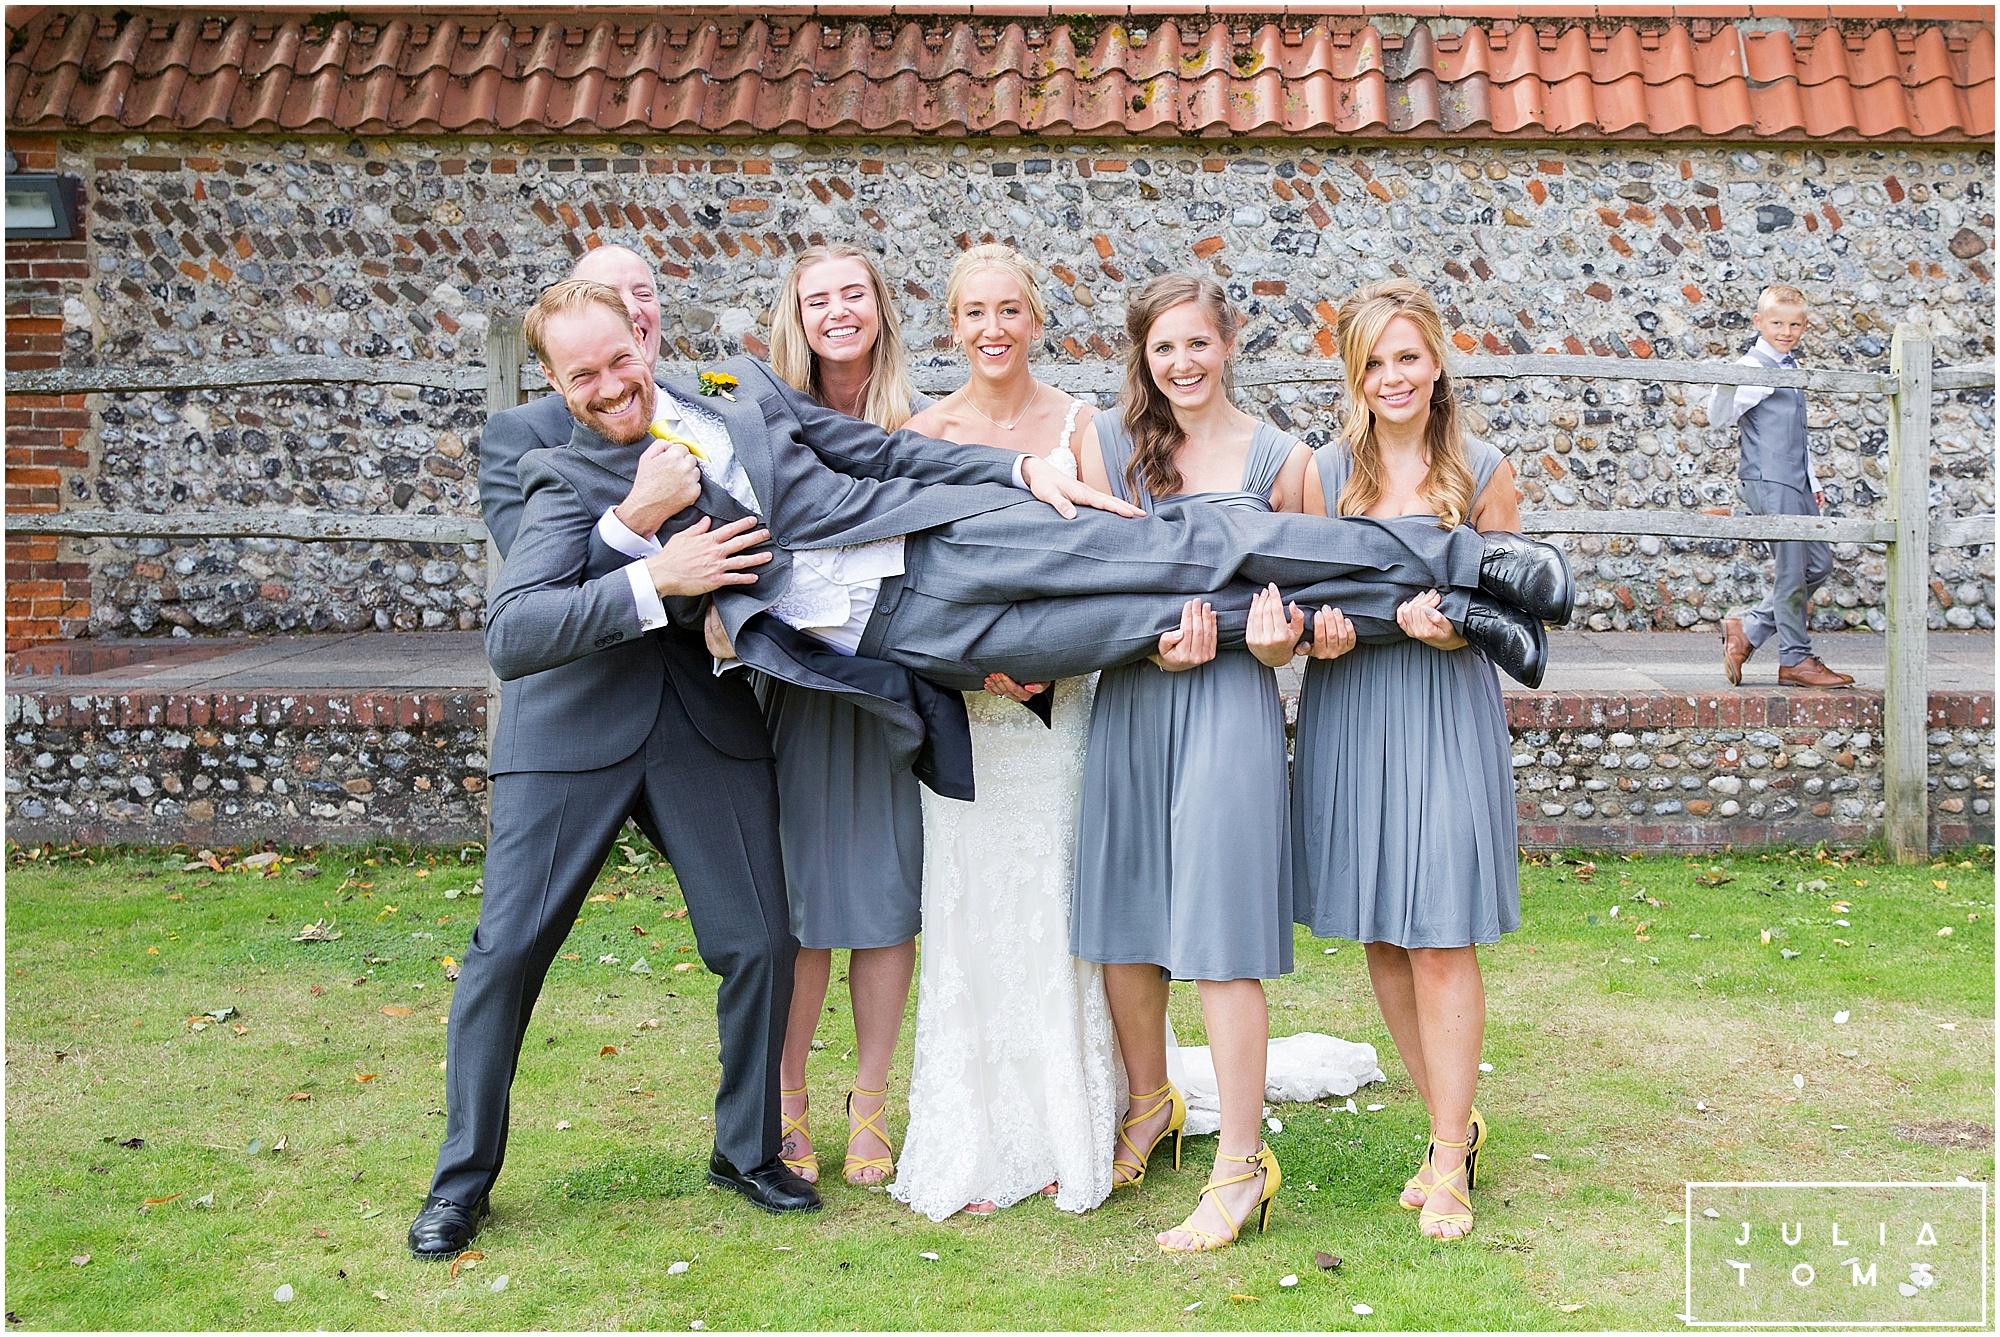 julia_toms_chichester_wedding_photographer_worthing_062.jpg